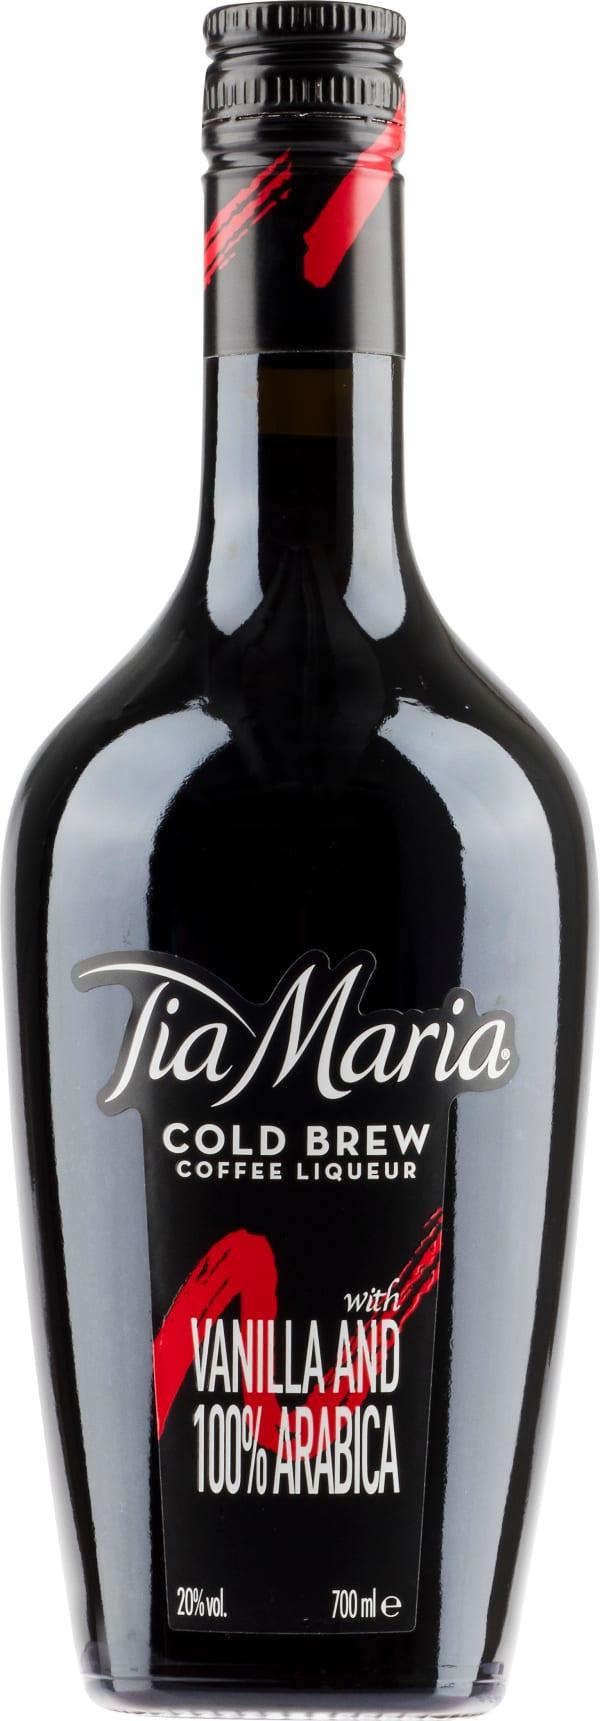 Tia Maria Cold Brew